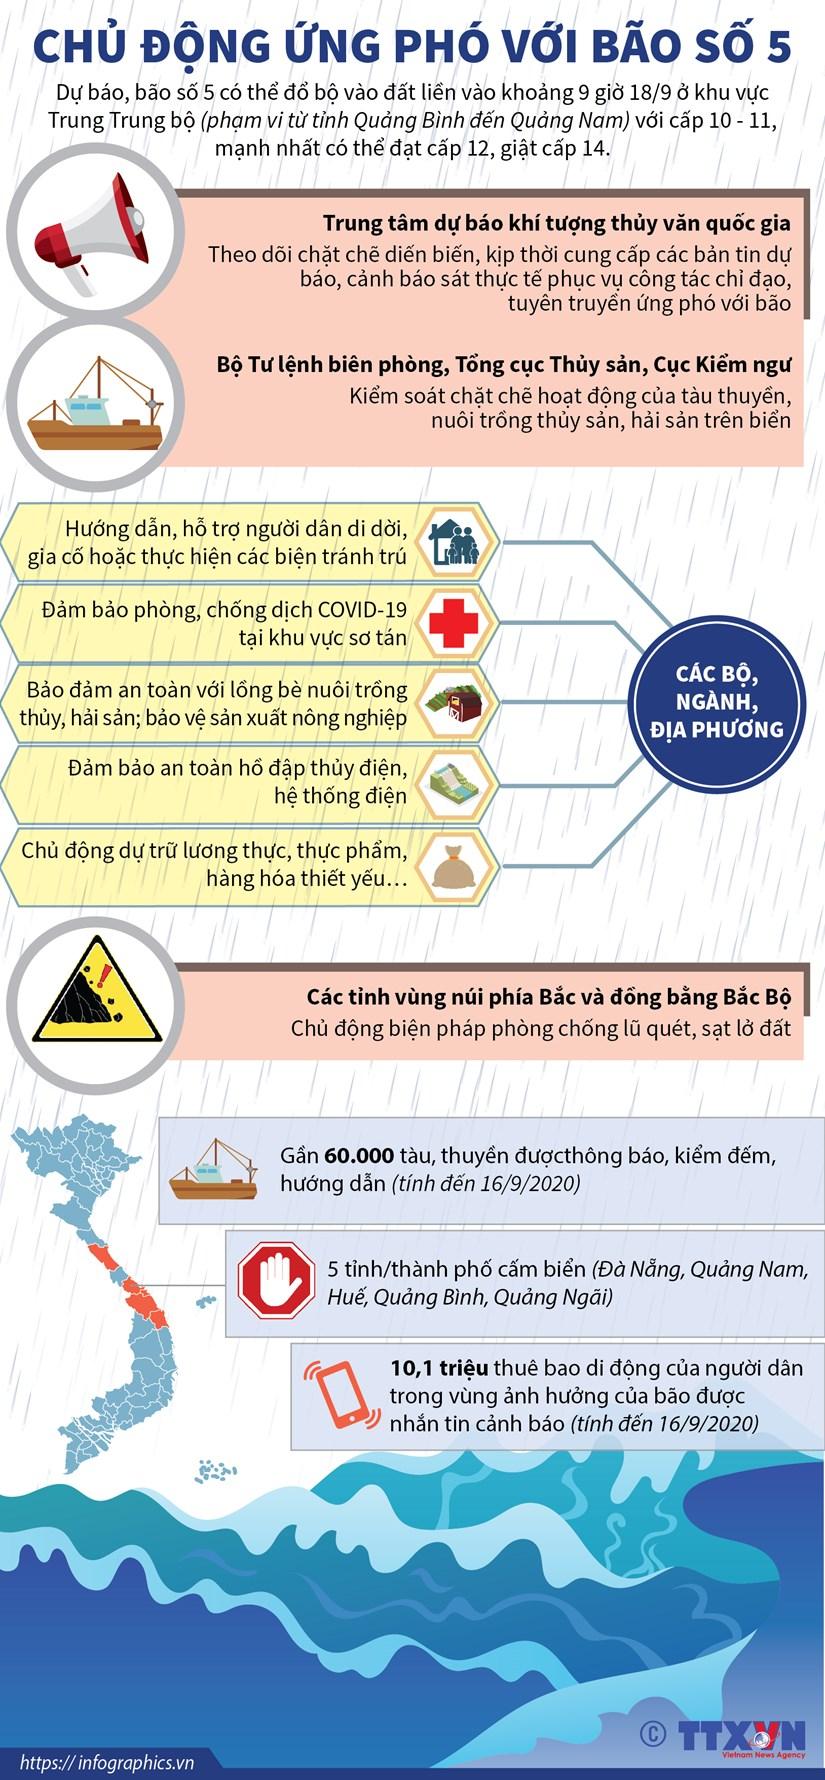 [Infographics] Cac dia phuong chu dong ung pho voi bao so 5 hinh anh 1